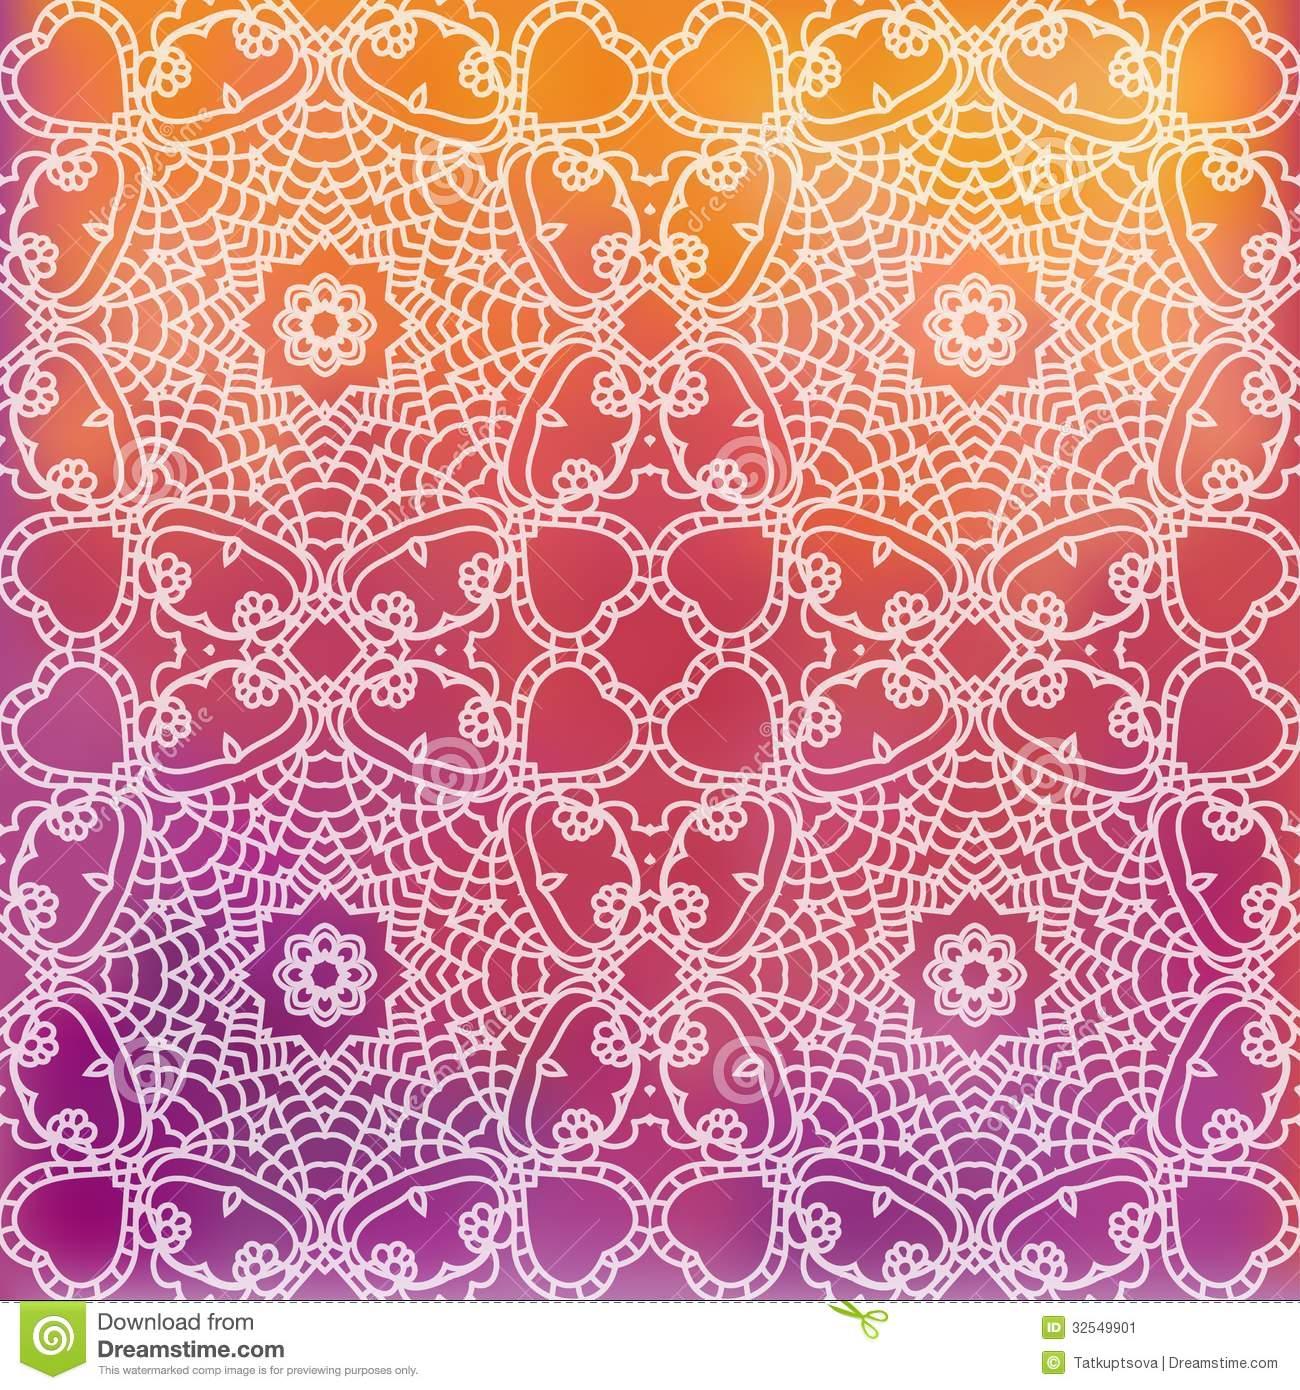 Free Download Indian Design Wallpaper Elegant Indian